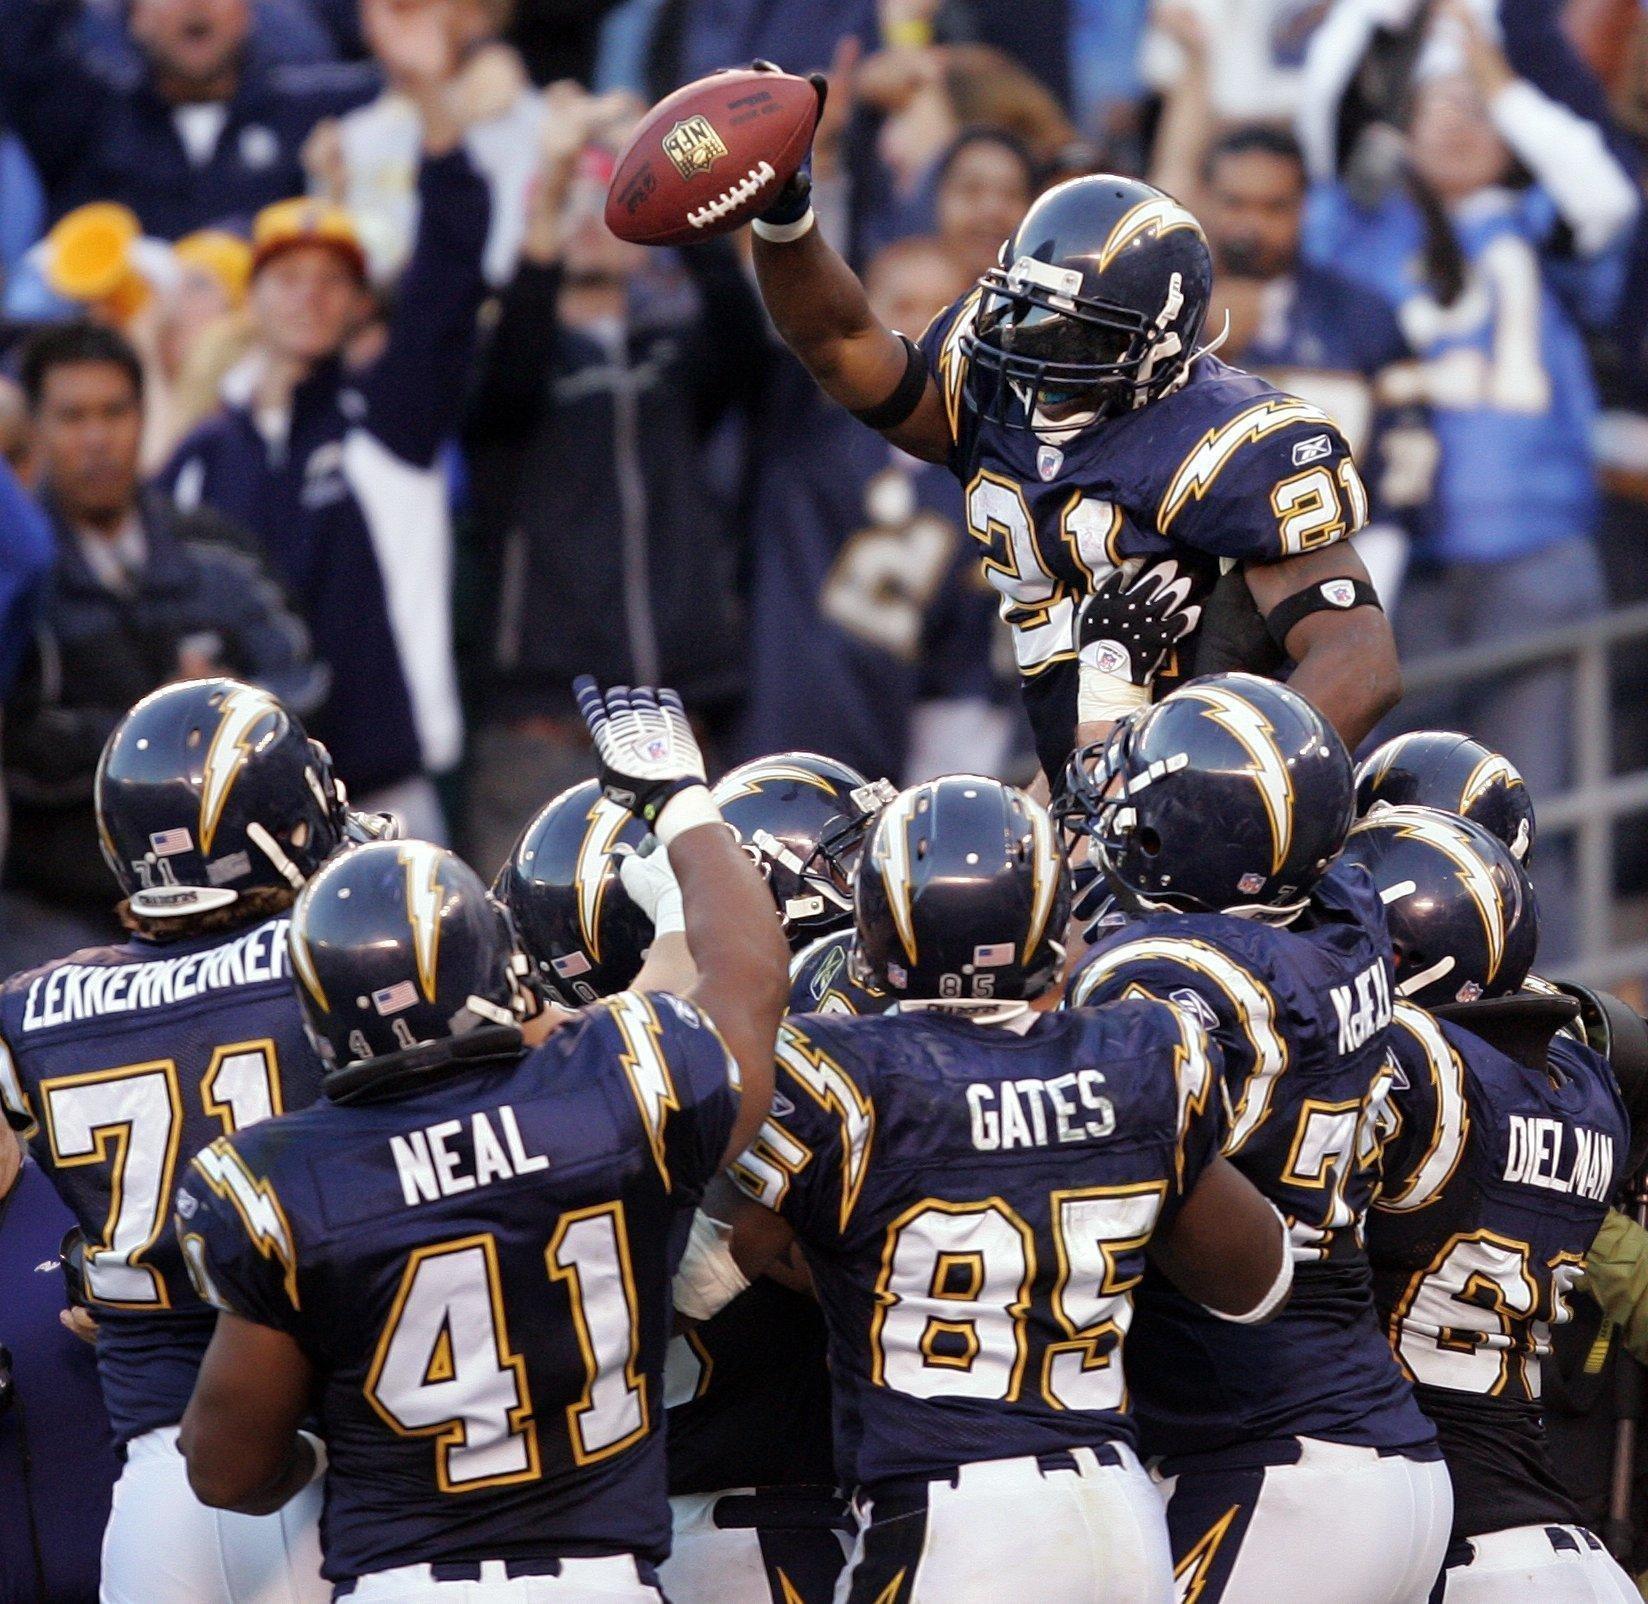 sdut-the-52-lt-sets-nfl-touchdown-record